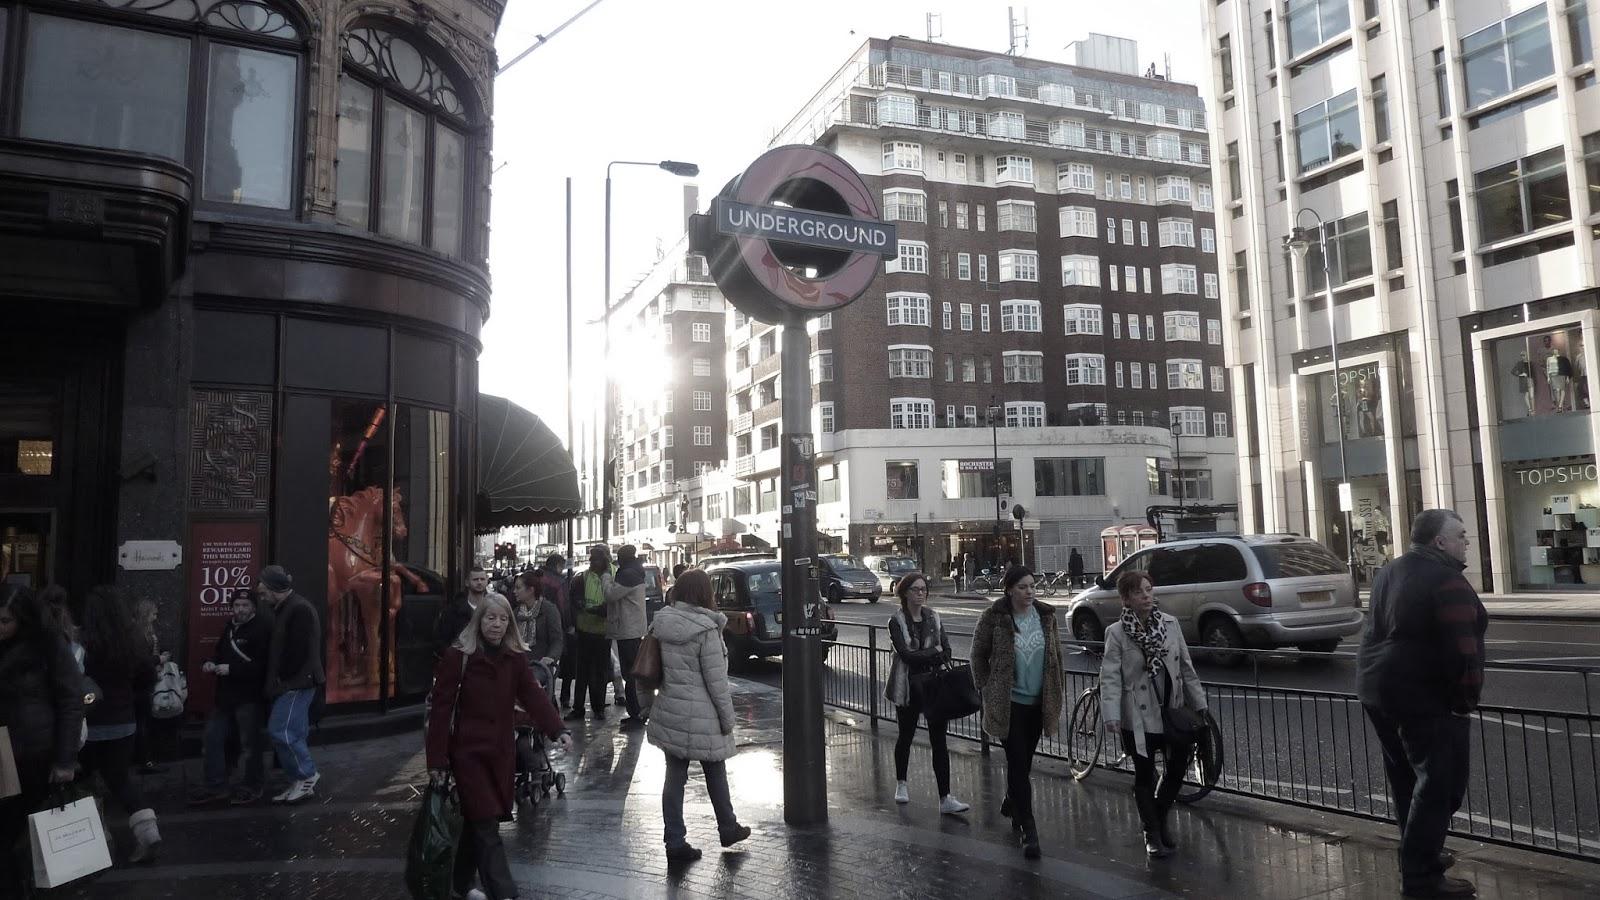 London Underground Knightsbridge